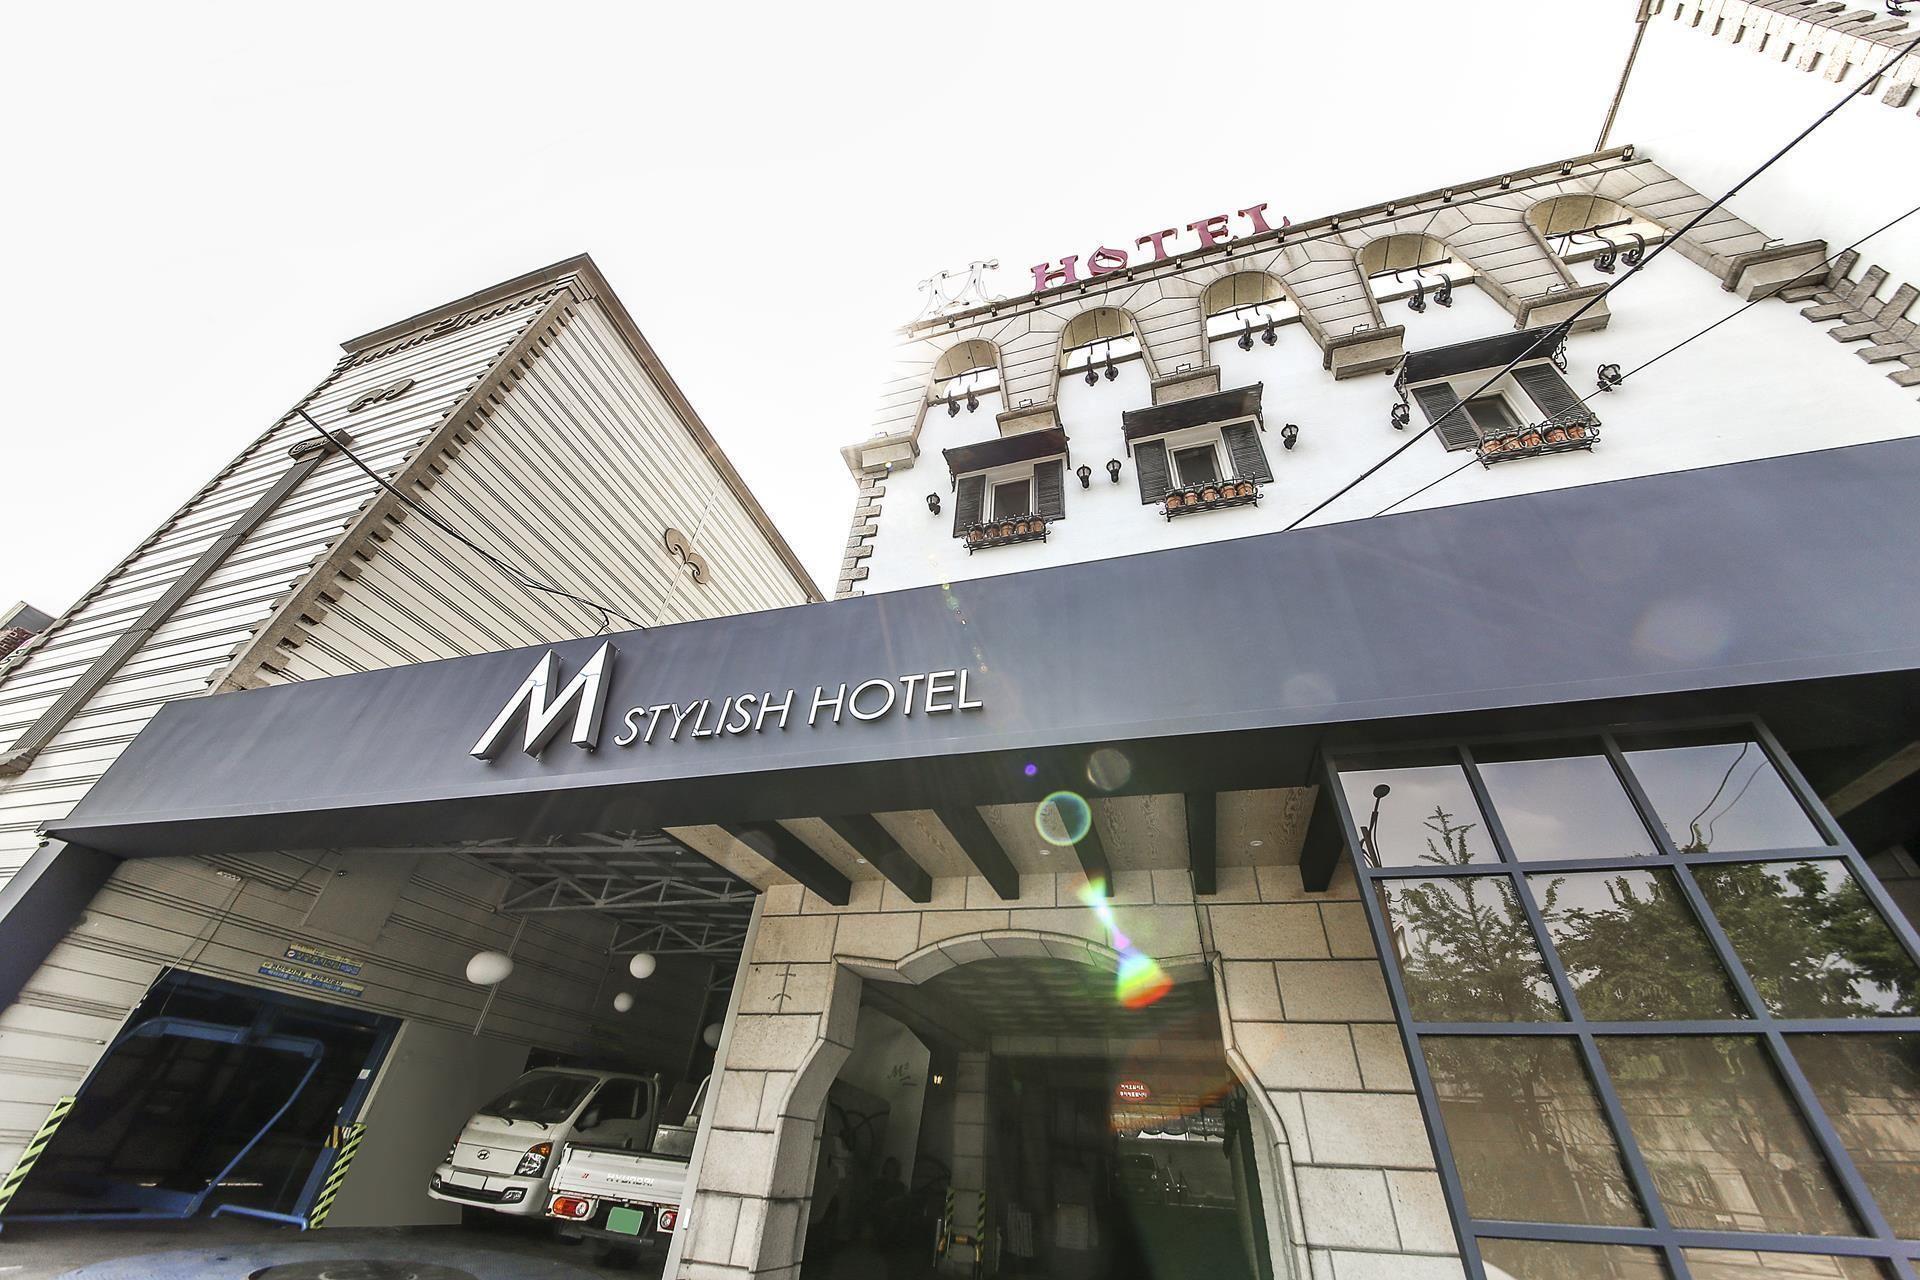 M Stylish Hotel